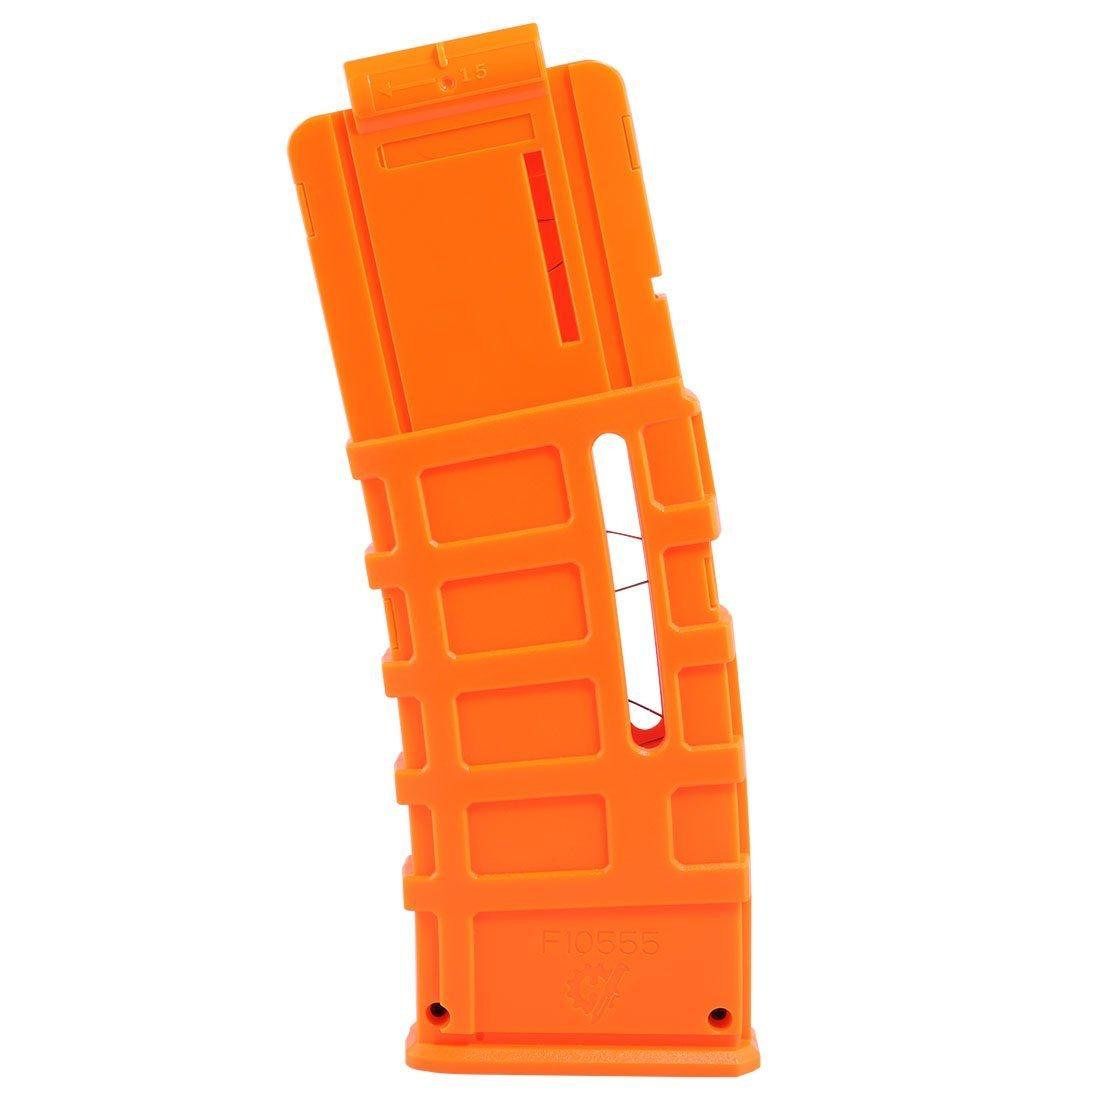 Do co-sport Dart Magazines, Worker F10555 15-Darts Banana Clip Injection Mold Magazine for Nerf N-Strike Elite Blaster Orange